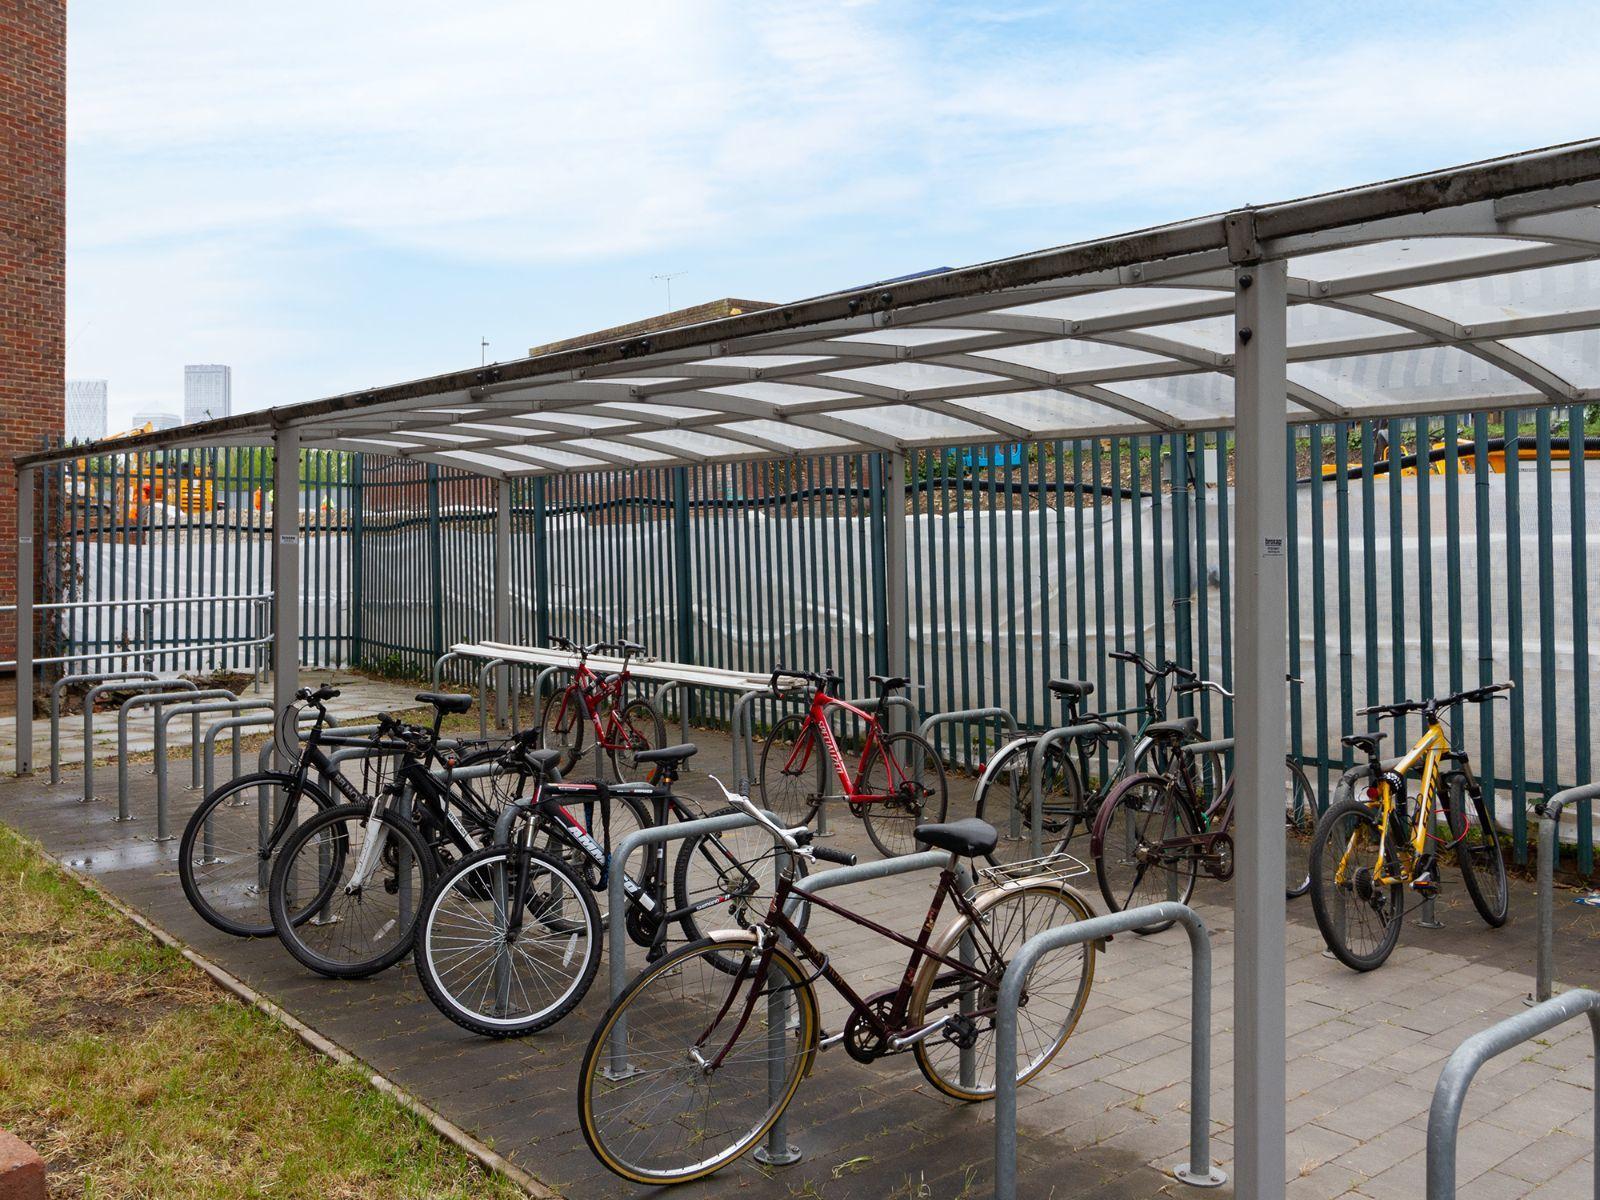 Surrey Quays Landale House Bike racks